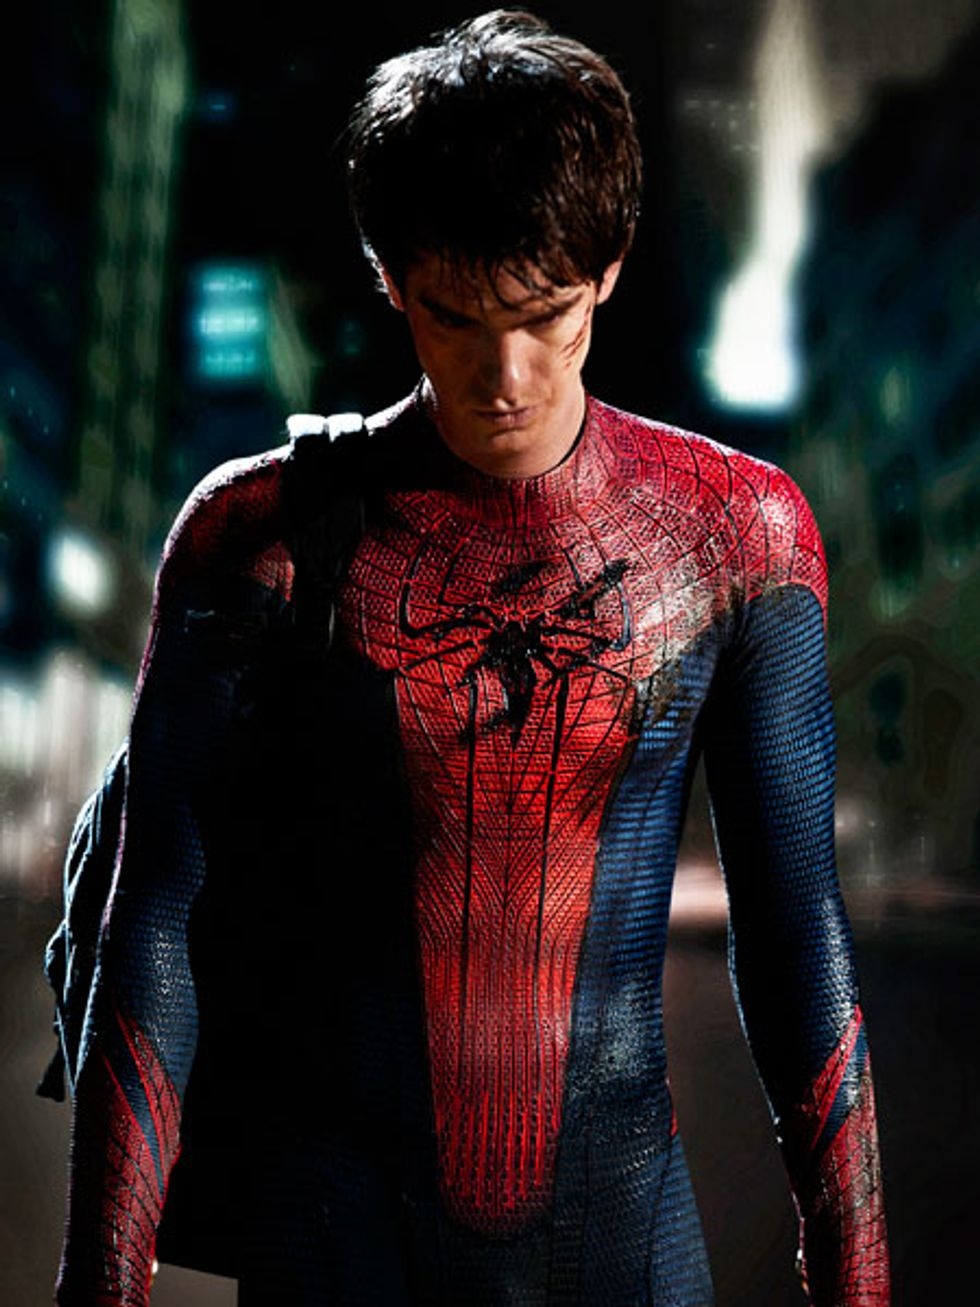 Trailer Trash: The Amazing Spider-Man